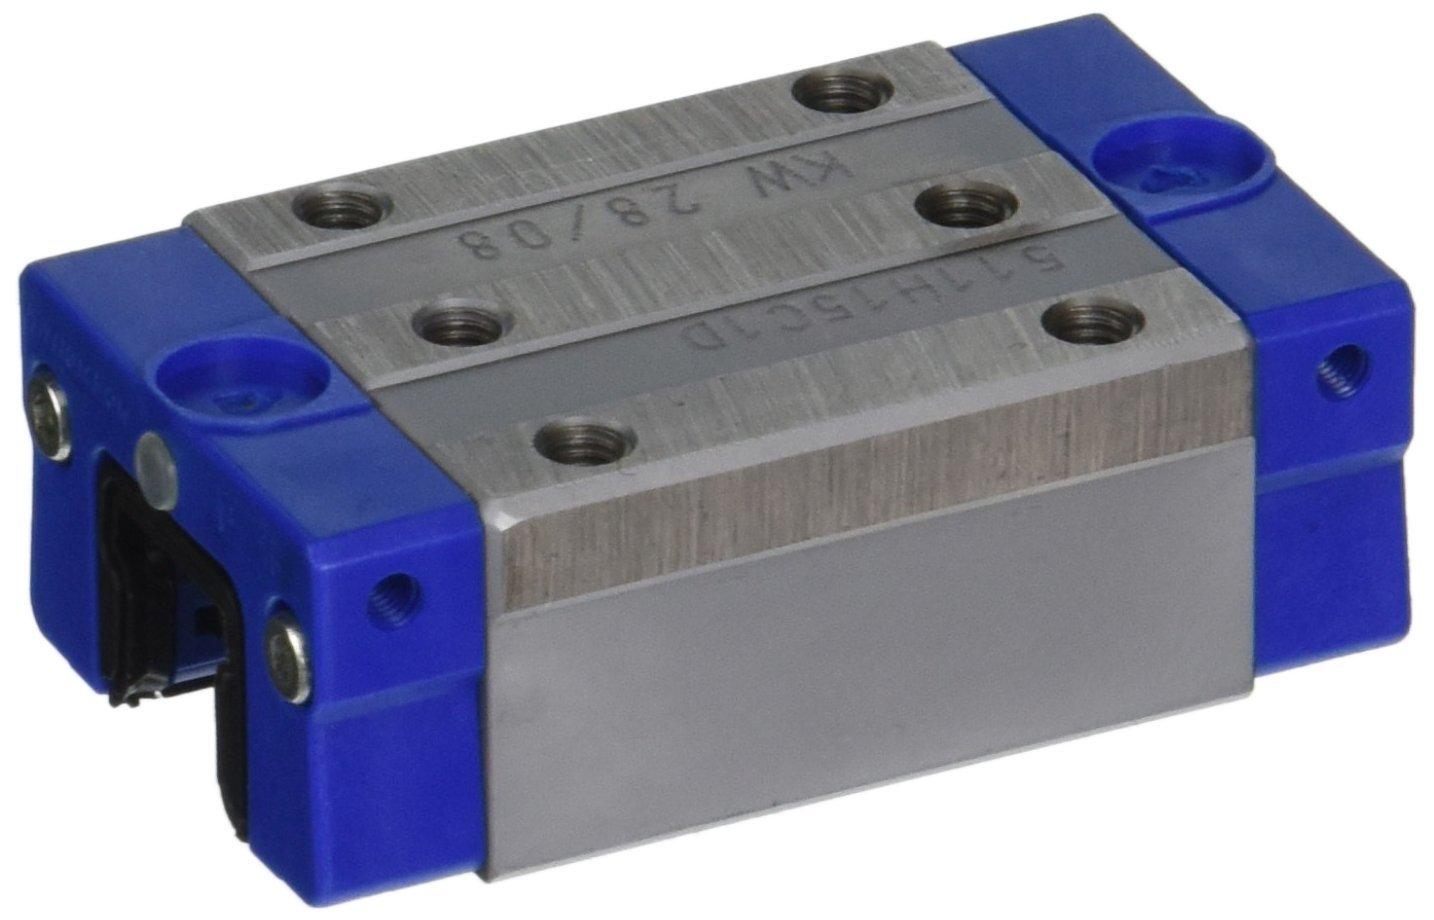 16mm Shaft Diameter Aluminum Thomson SRM16 Shaft Support Rail 600mm Length